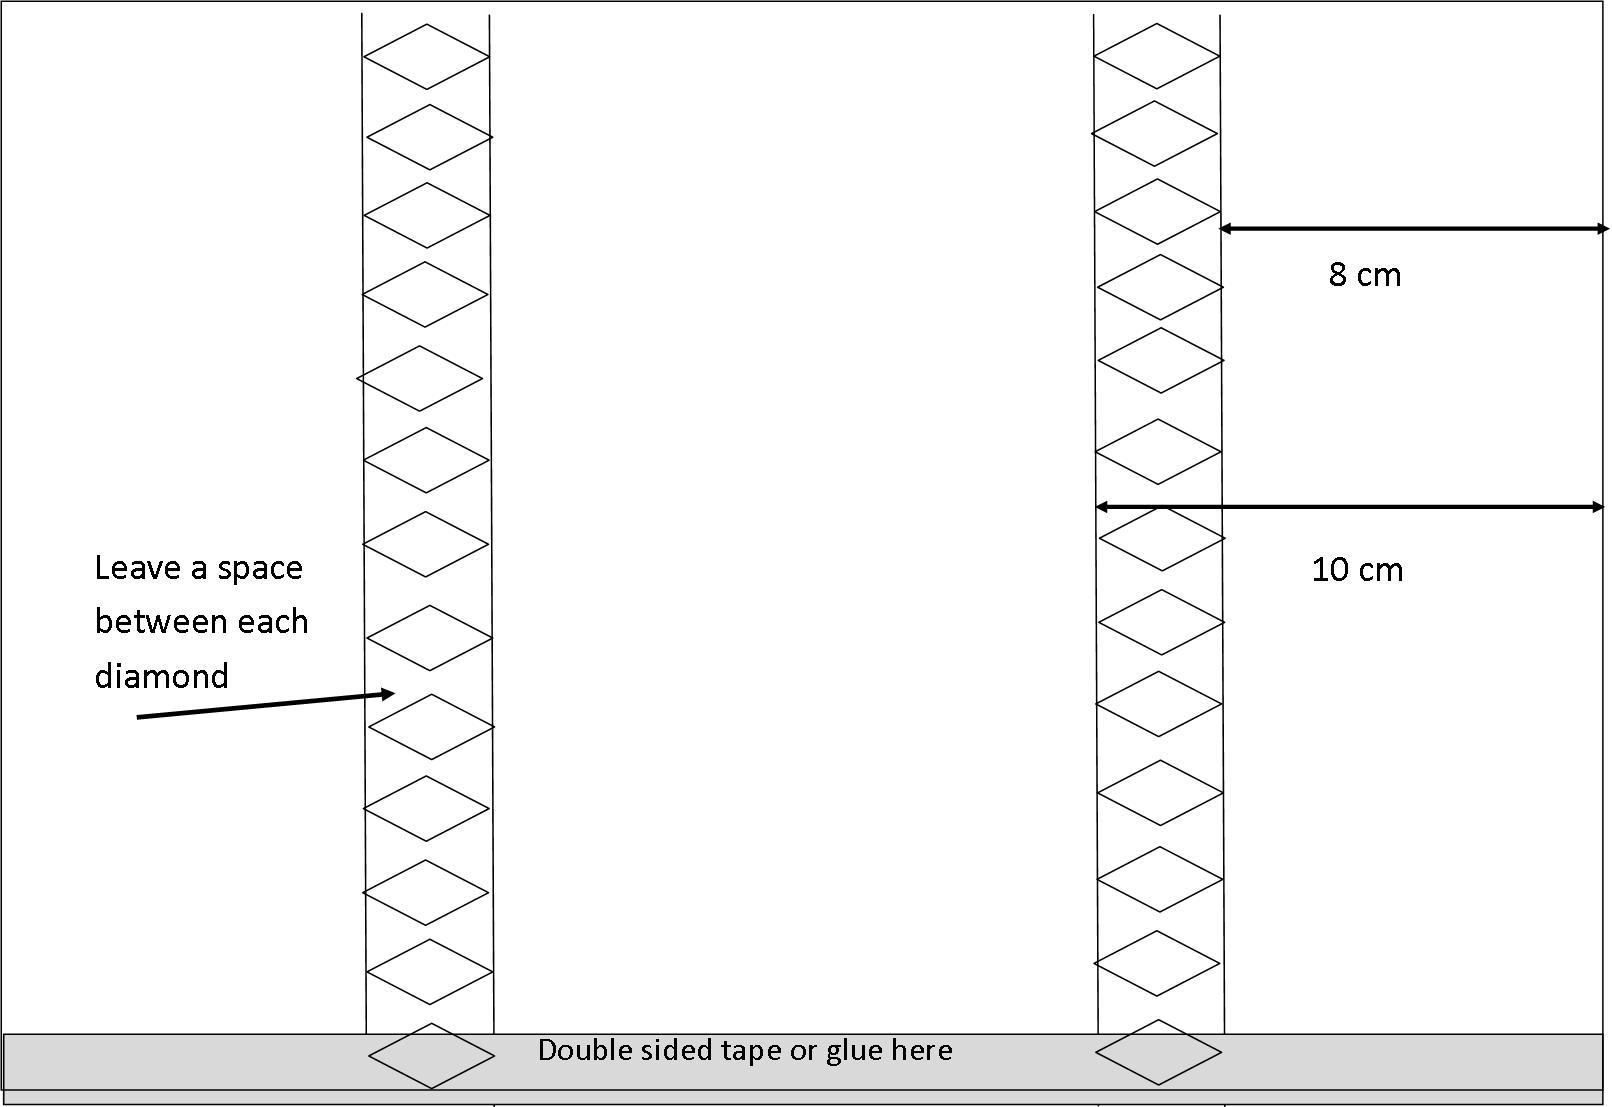 Make your own cracker diagram hours of fun hours of fun craft countdown to christmas make your own crackers 9 days to go make your own cracker diagram solutioingenieria Gallery